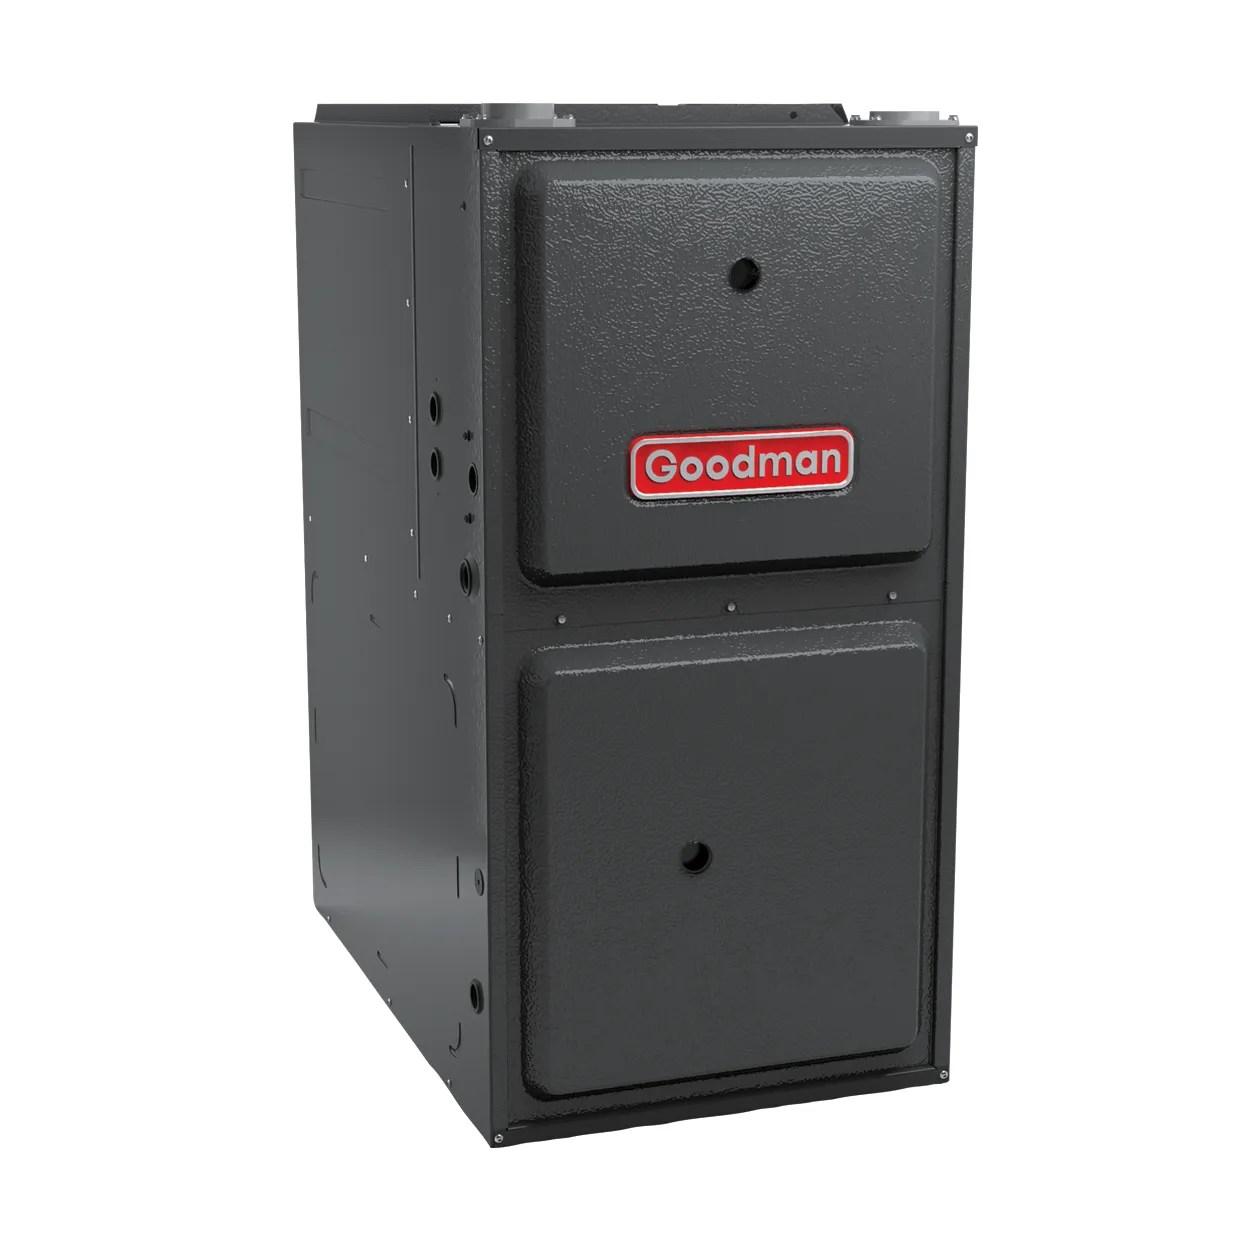 Goodman Gas Furnace GMES92